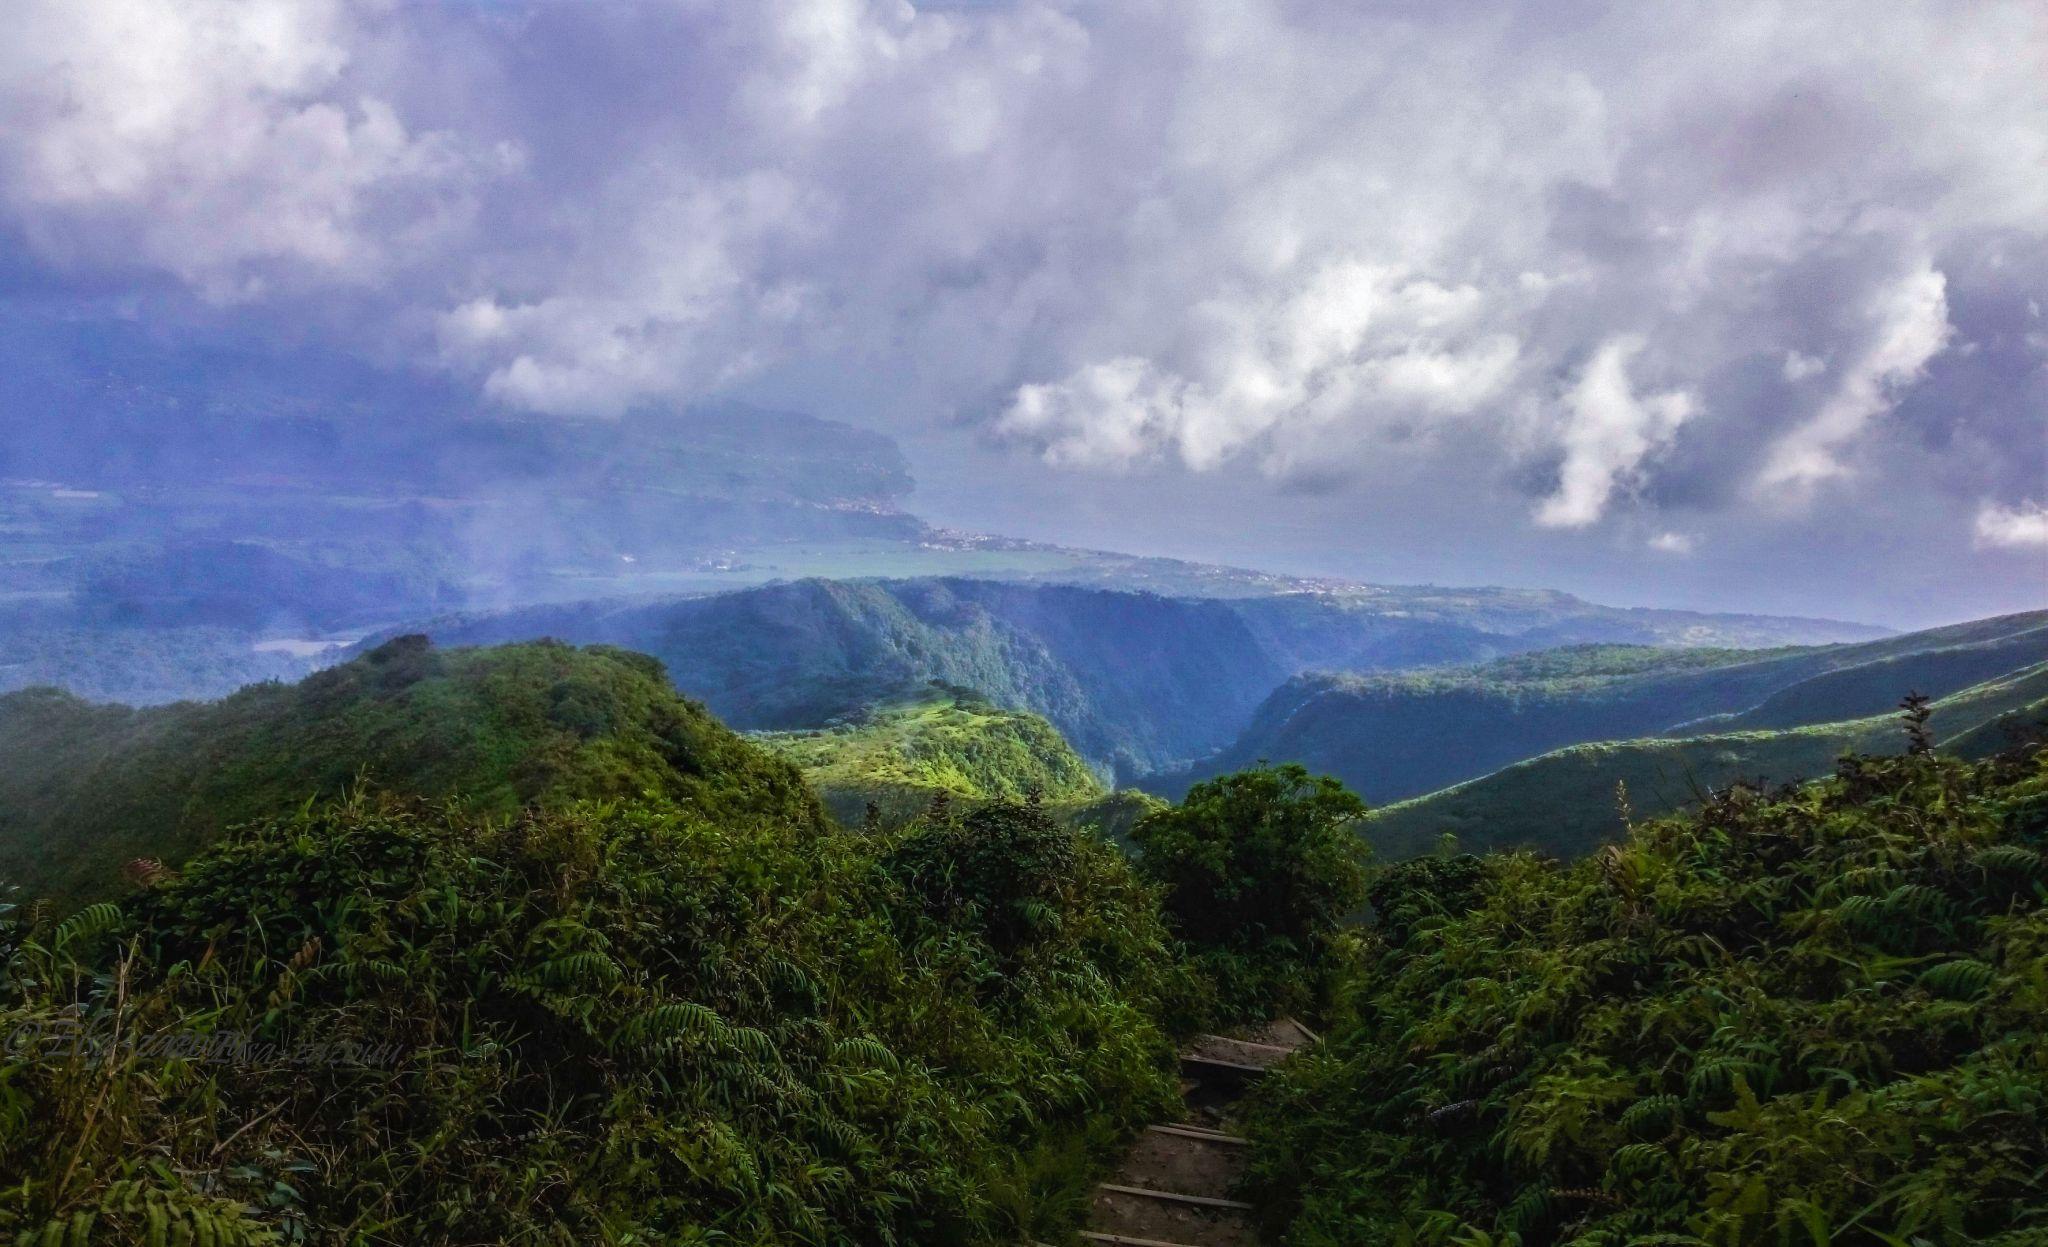 Mount Pelée, Martinique